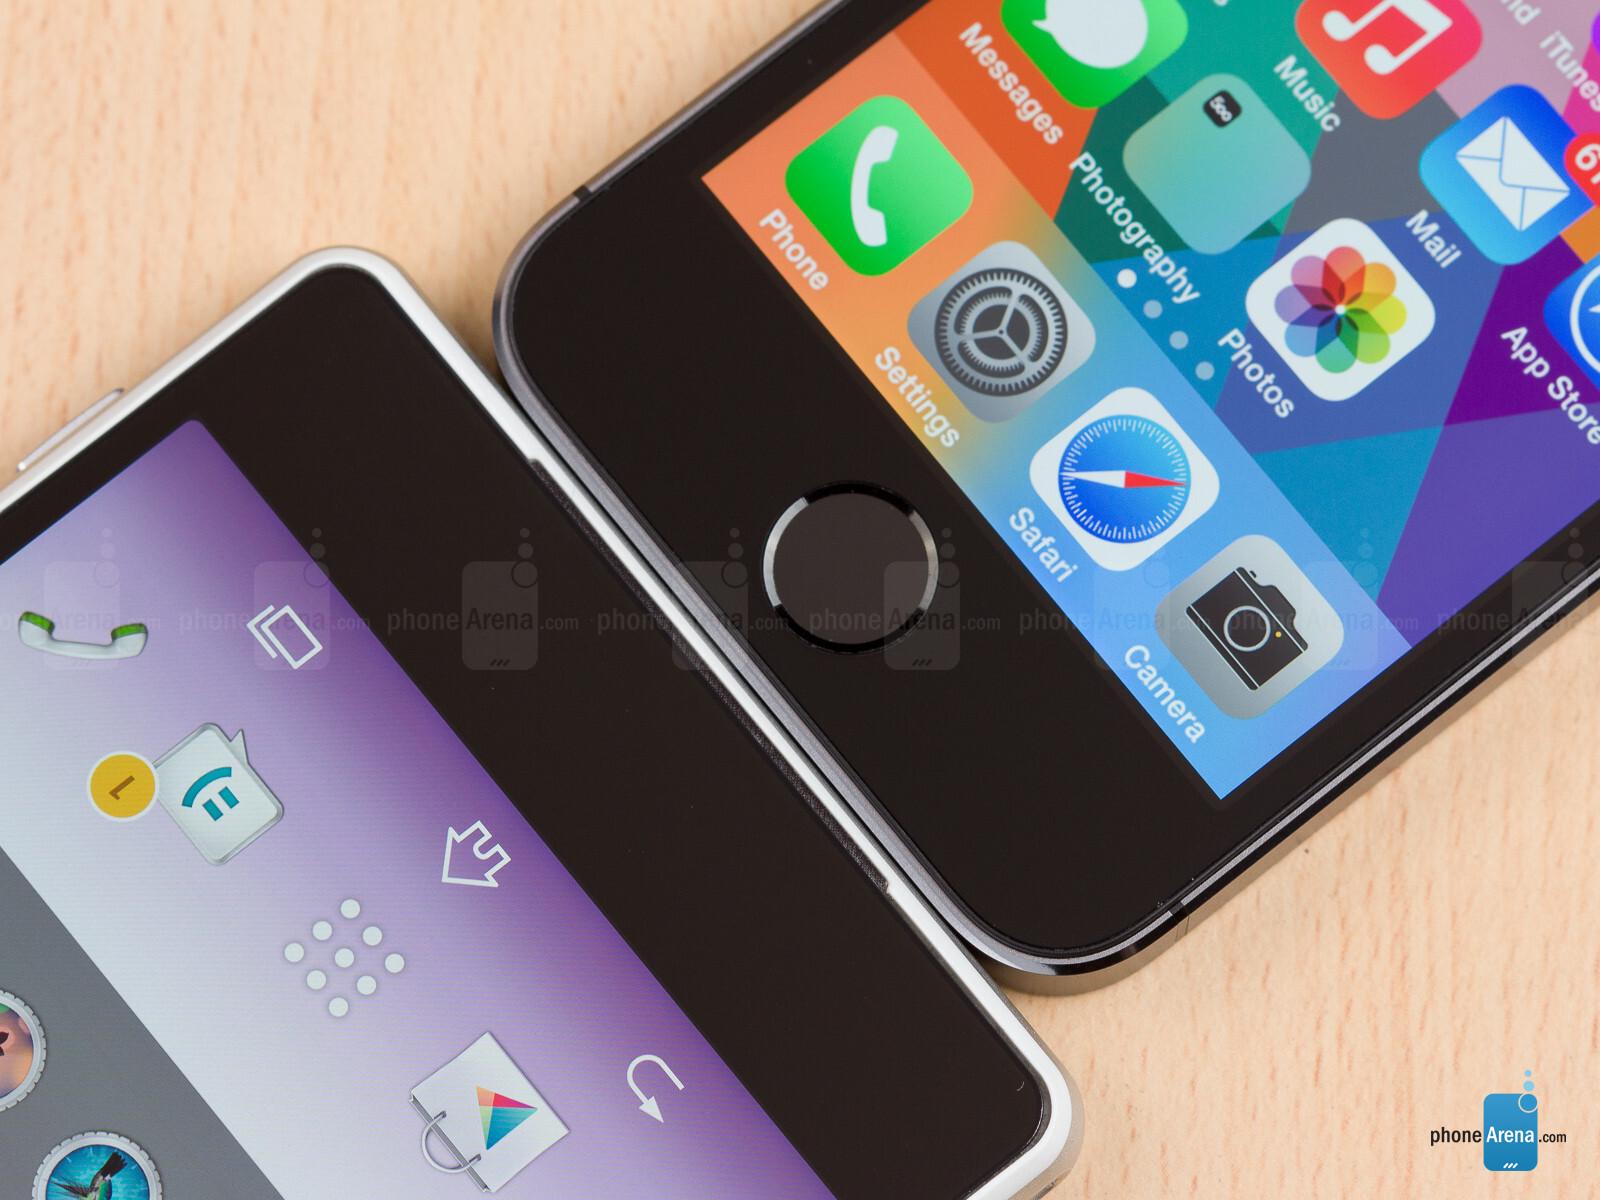 Sony Xperia Z2 vs Apple iPhone 5s 05